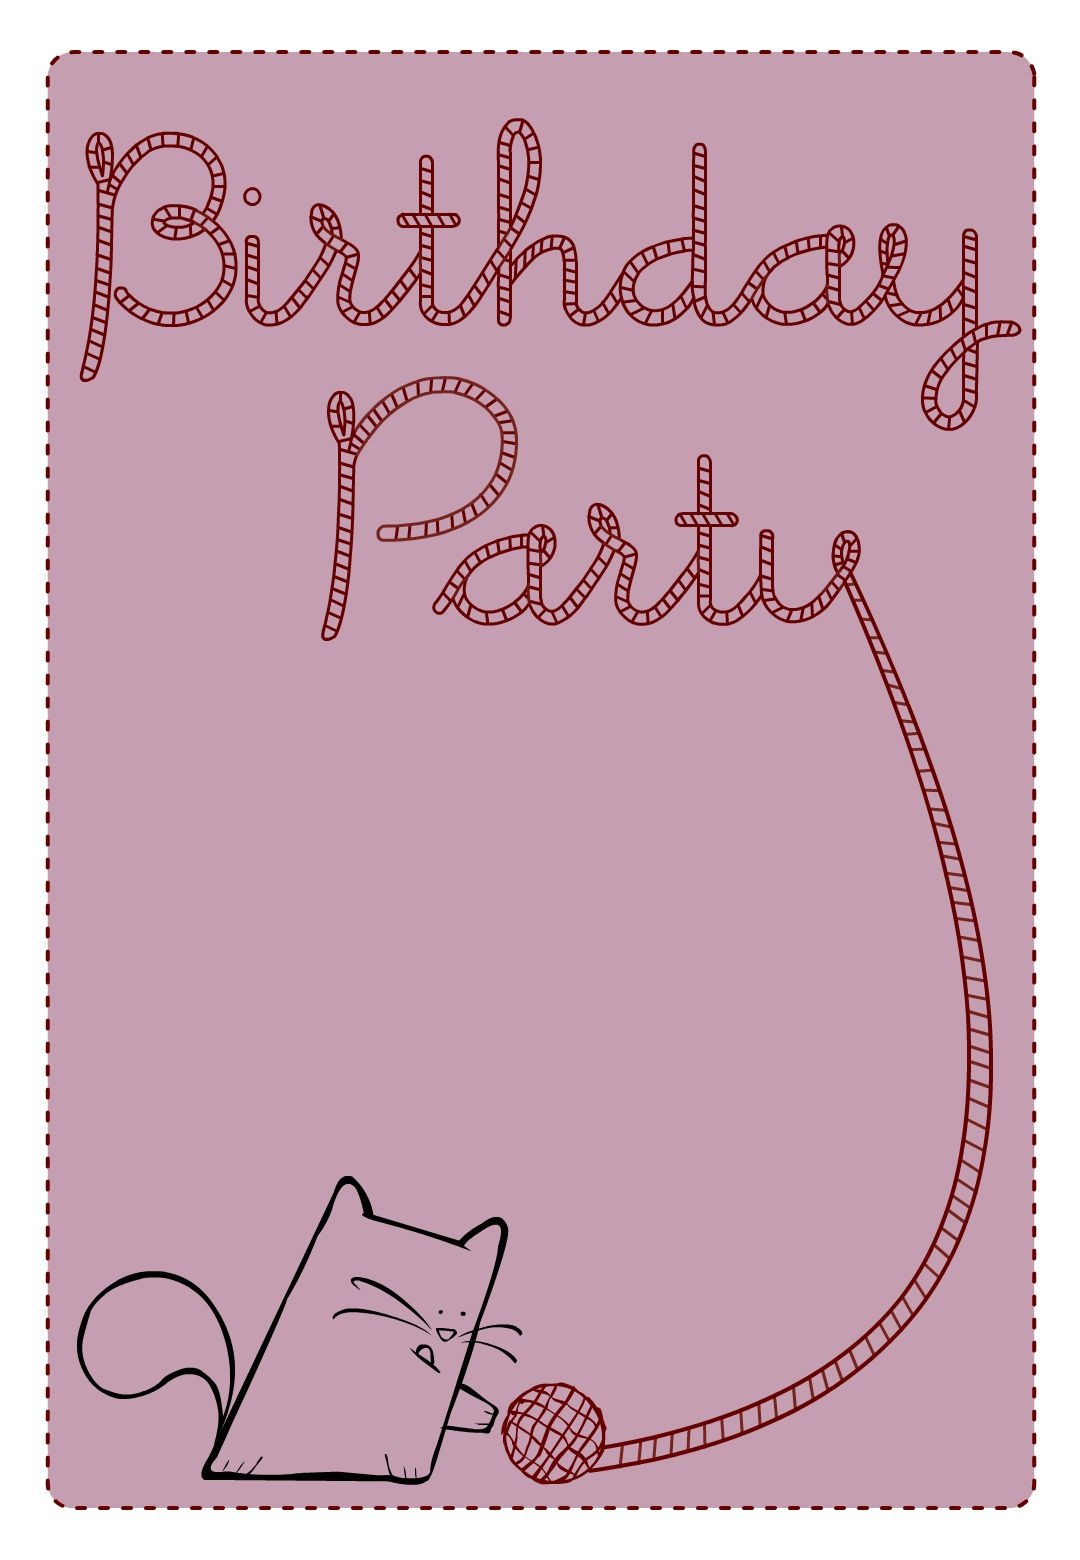 Free Printable Birthday Party Cat Invitation   Birthday Party Ideas - Free Printable Birthday Invitations Pinterest